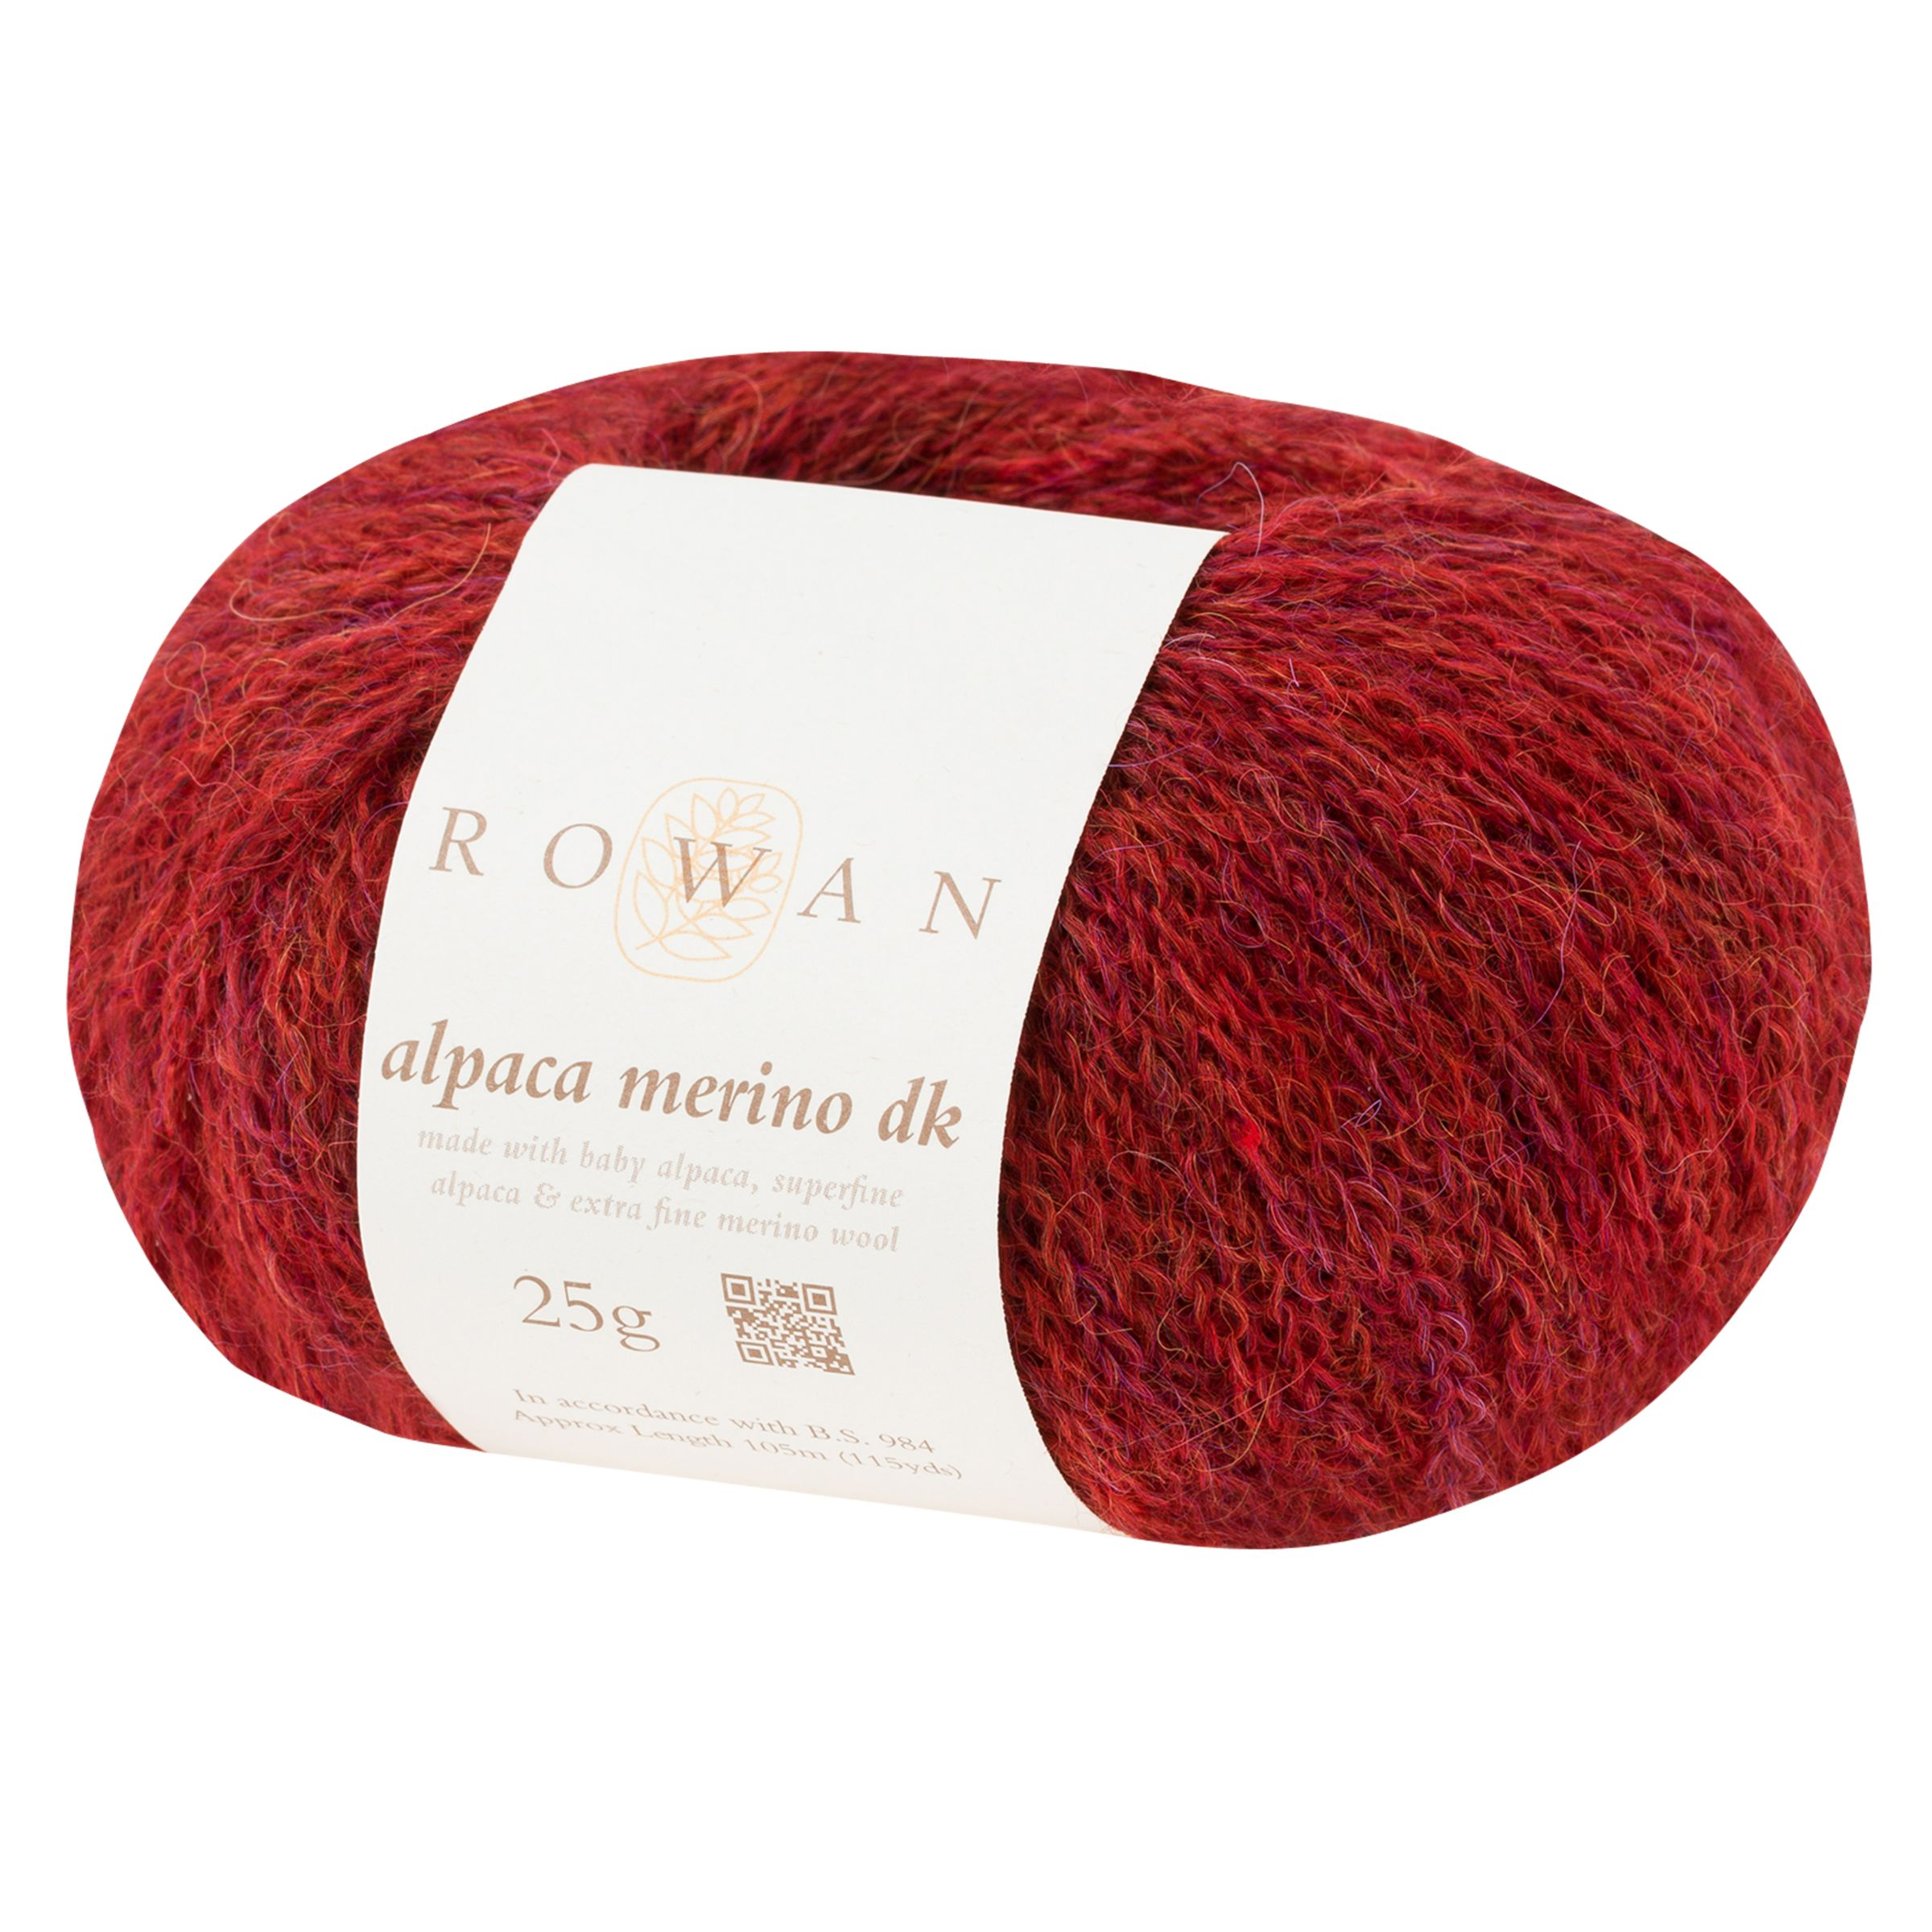 Rowan Rowan Alpaca Merino DK Yarn, 25g